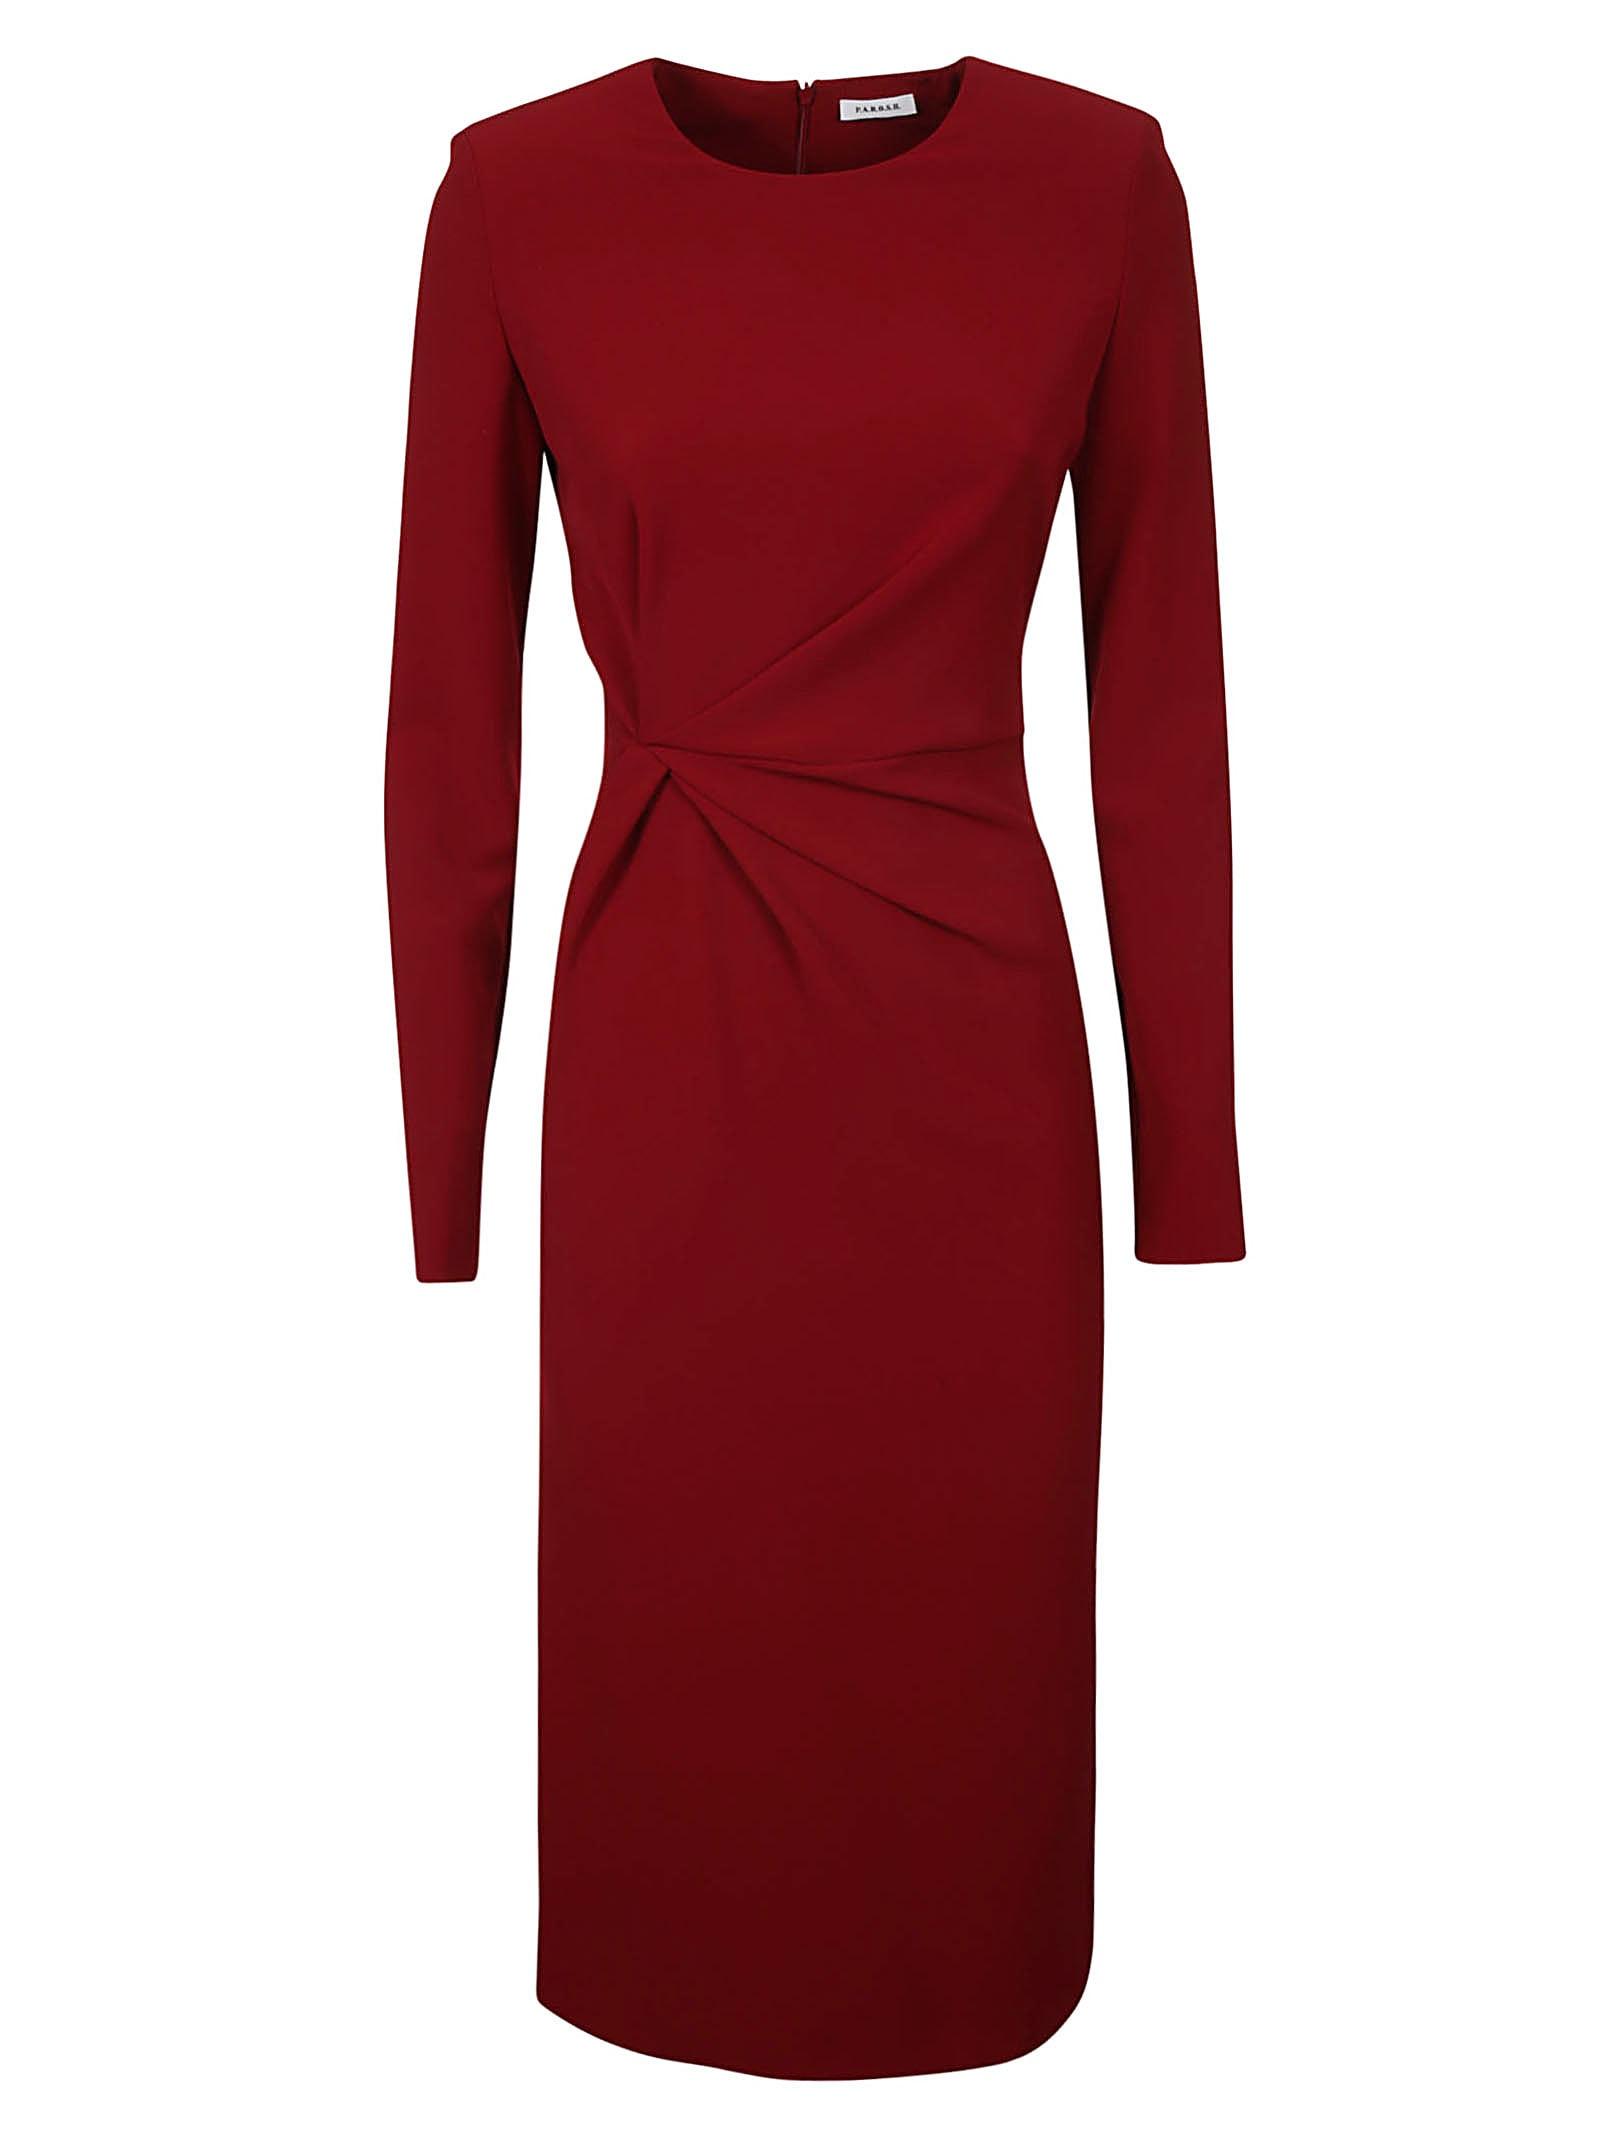 Parosh Rear Zipped Dress